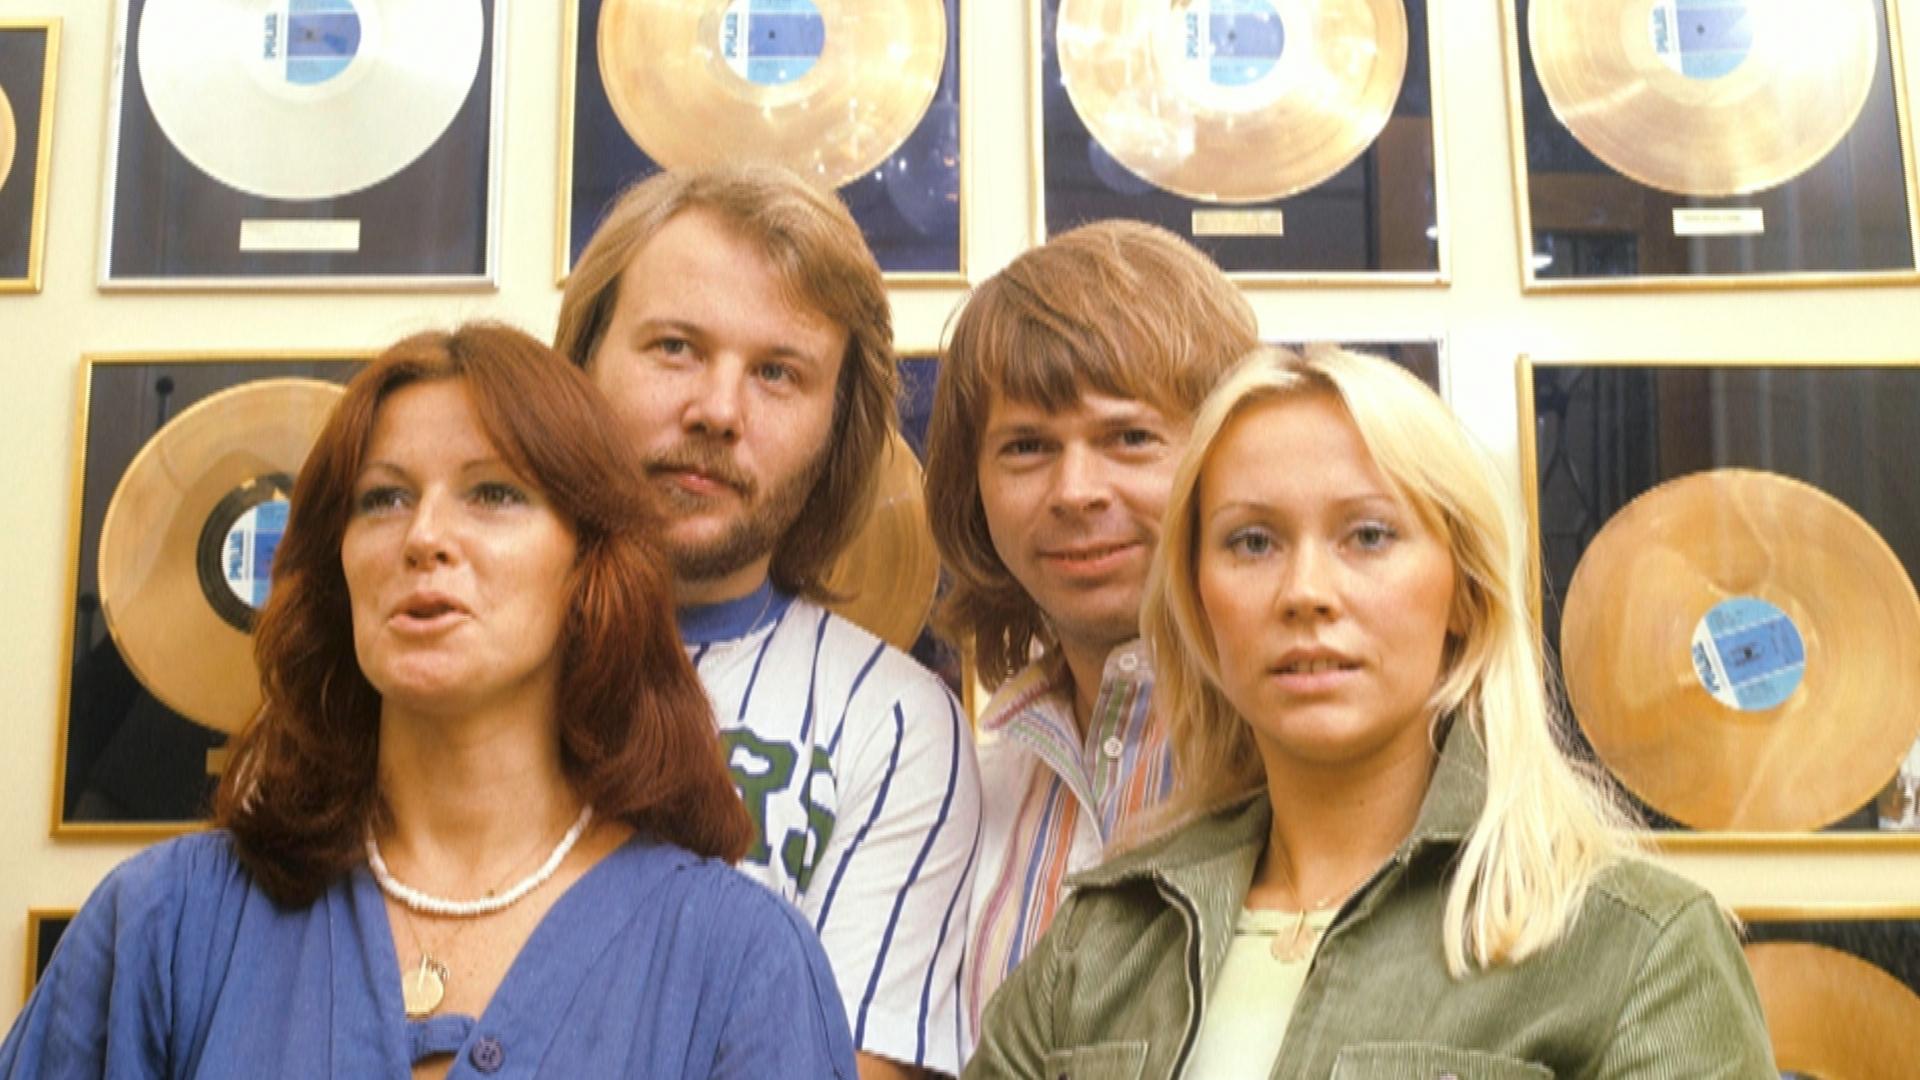 ProSieben sagt Thank You For The Music, ABBA!